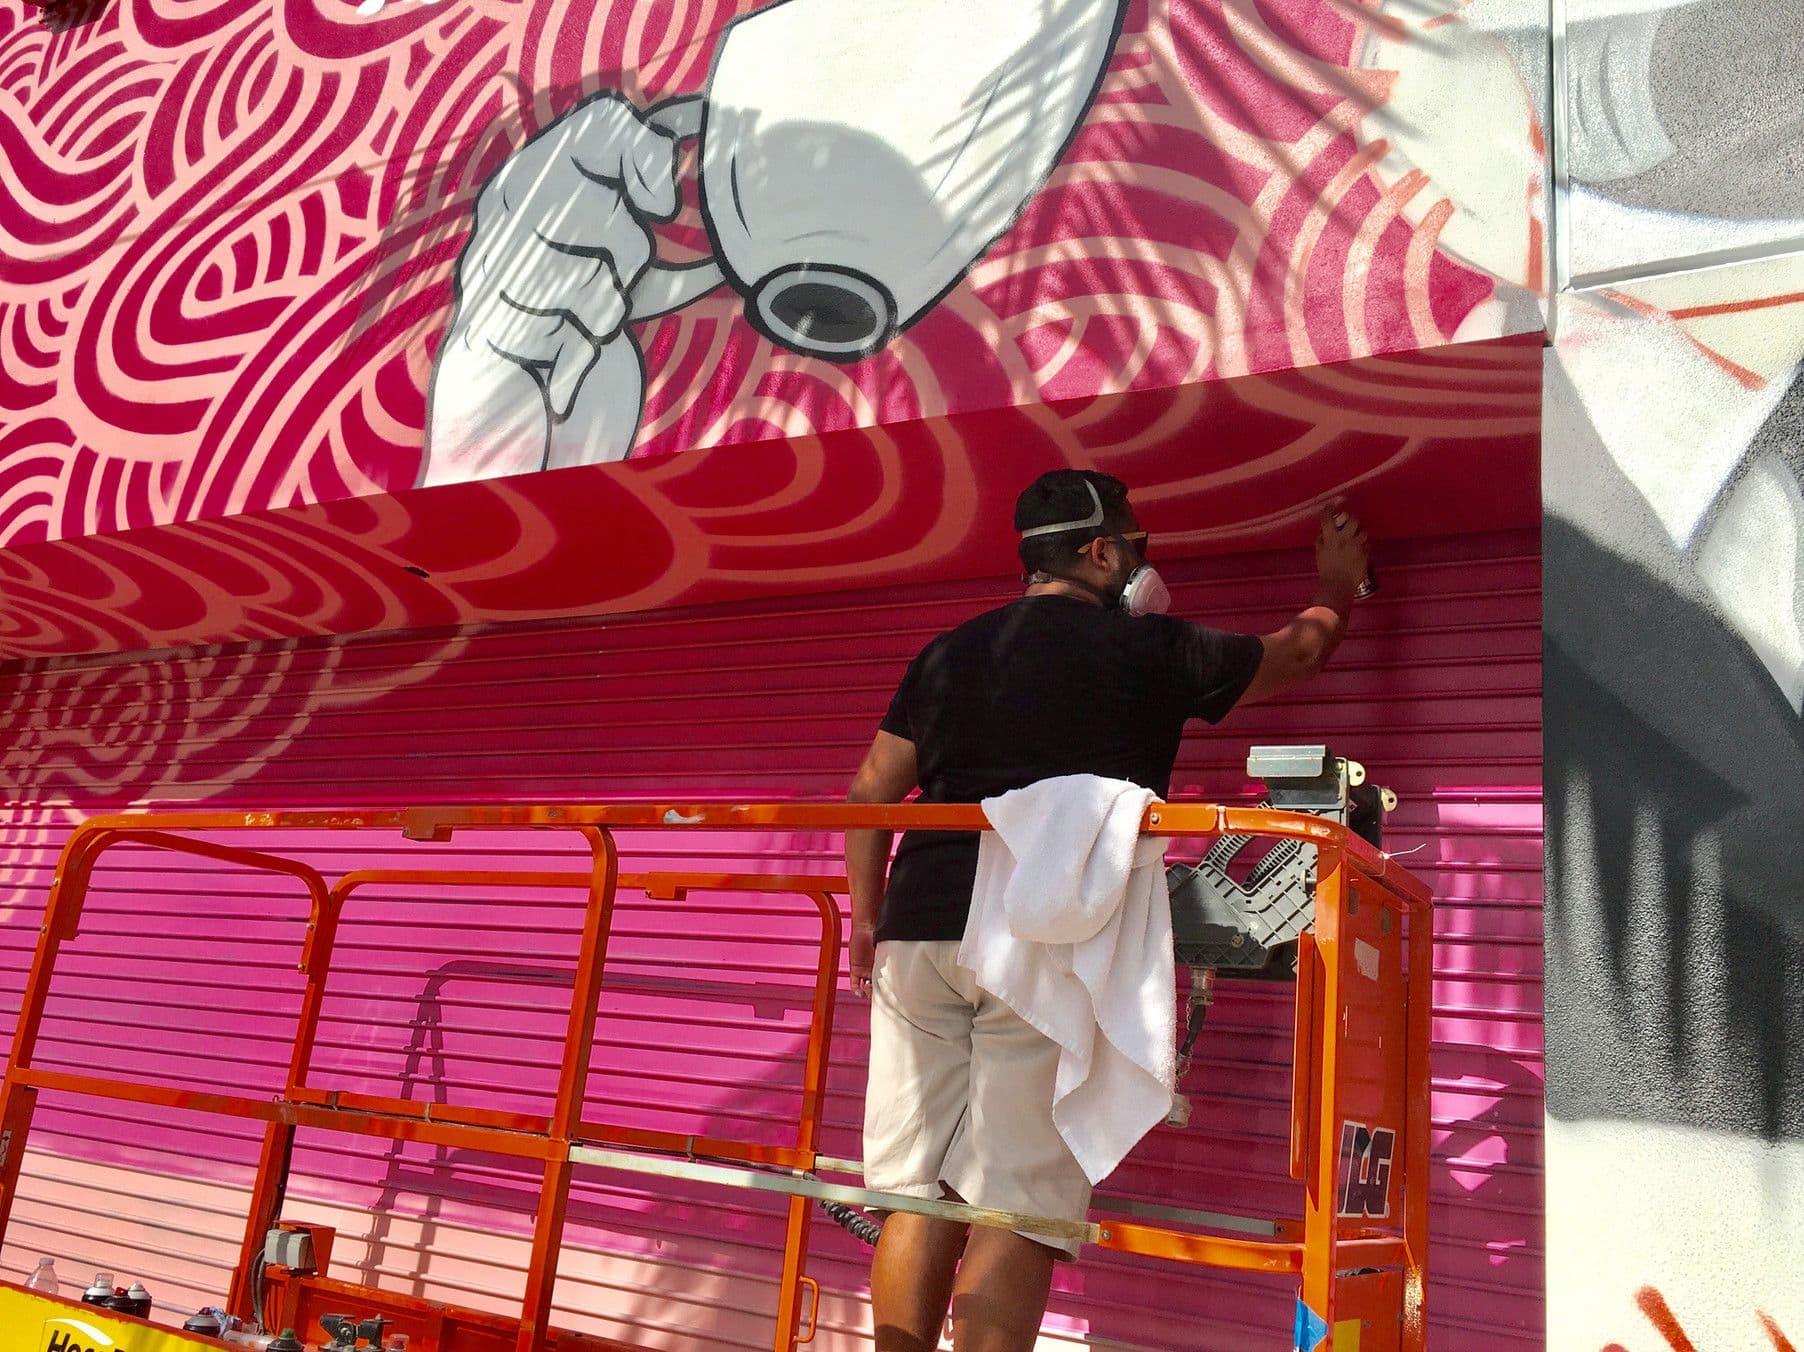 Street Murals by Jorge-Miguel Rodriguez seen at JOE & THE JUICE, Miami - Joe & The Juice